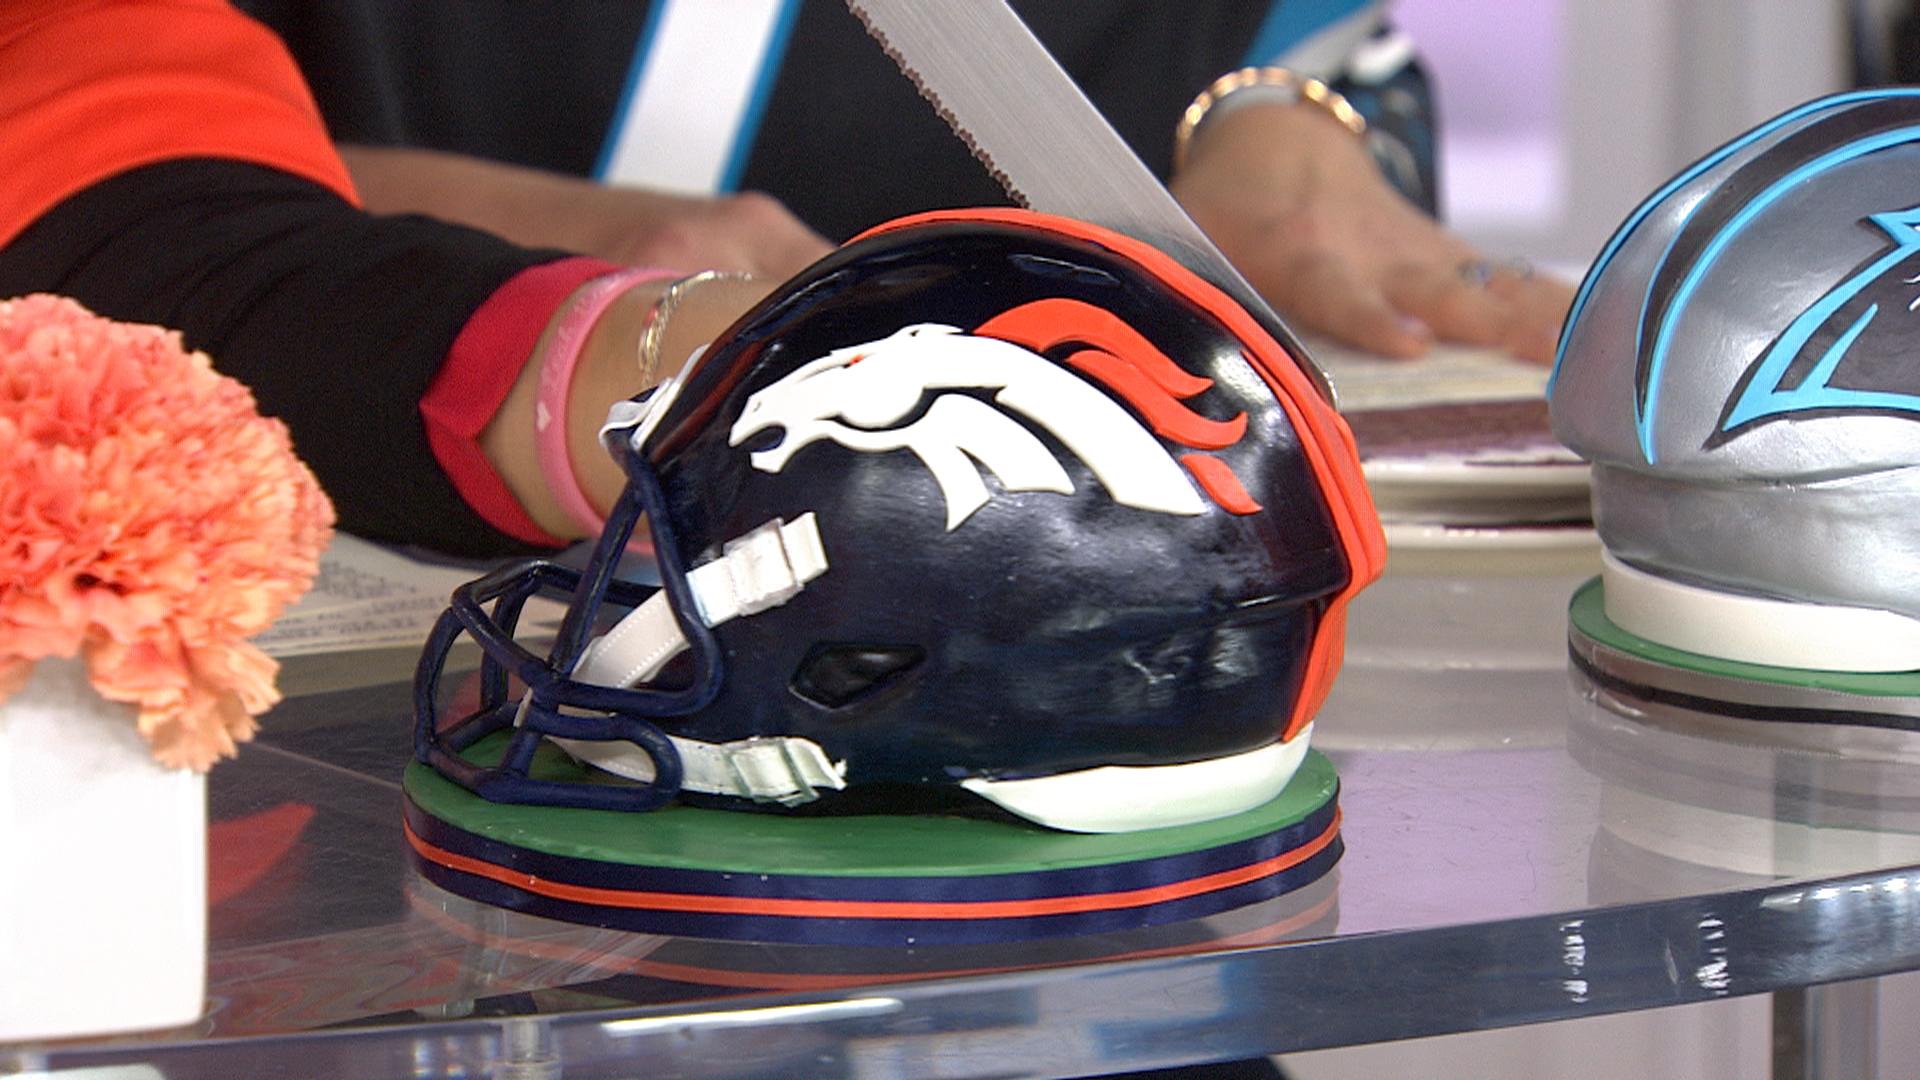 Hoda and Jenna Bush Hager dig into Super Bowl cakes